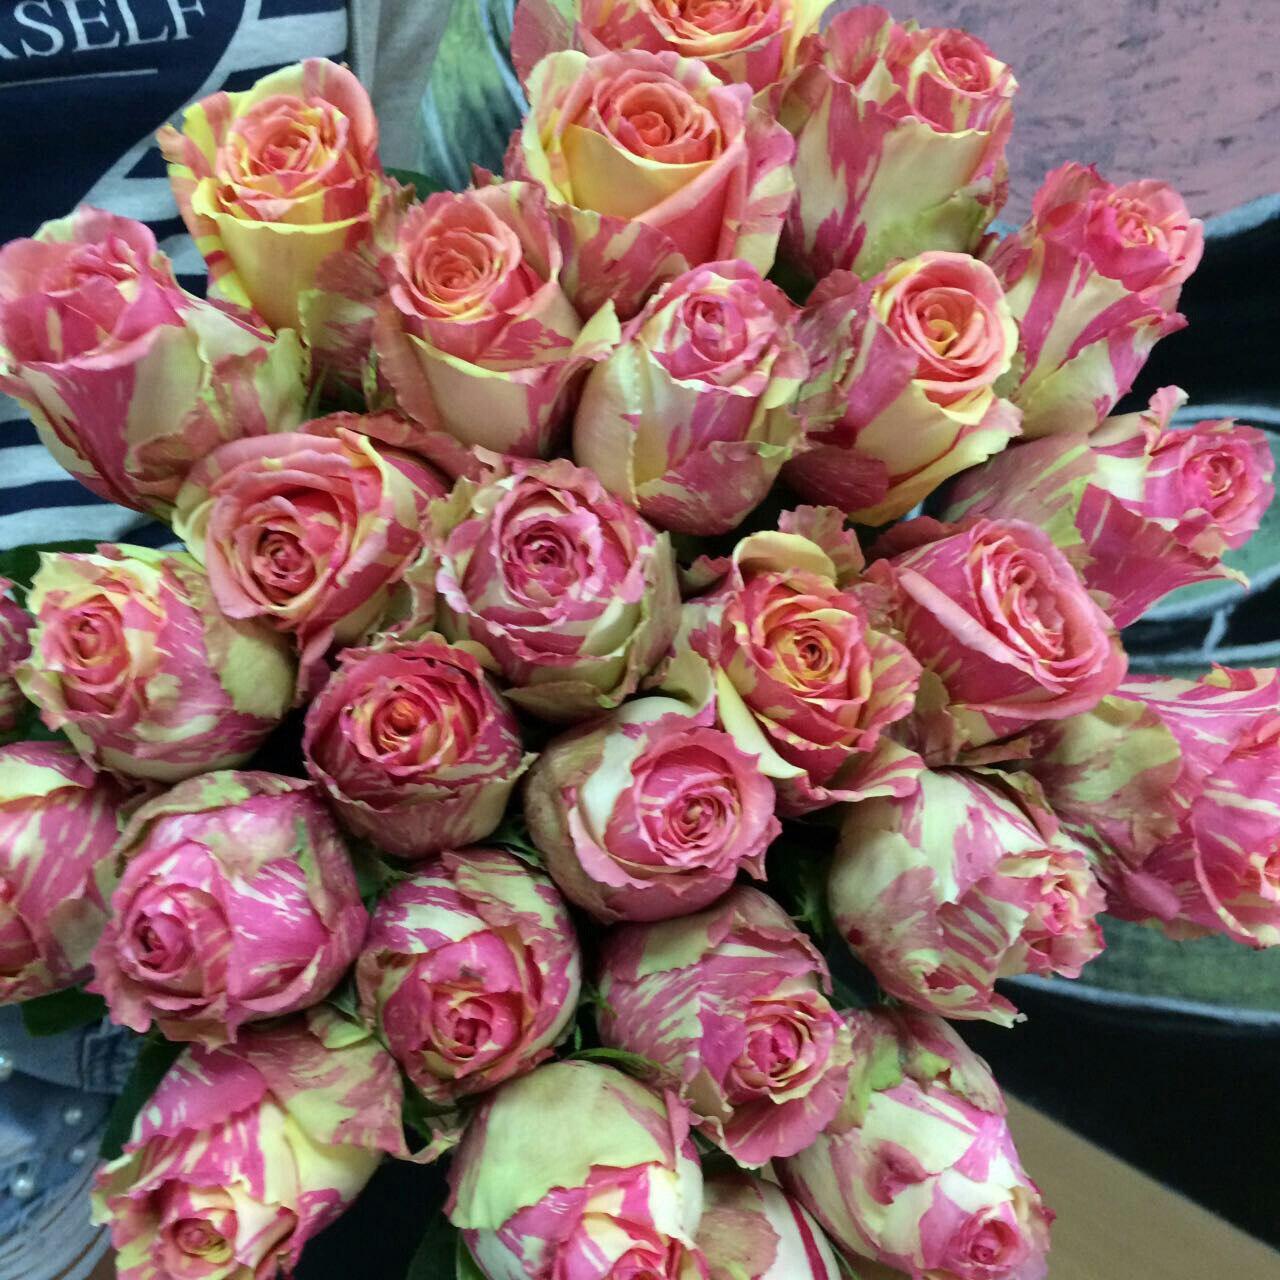 Букет, доставка цветов в витебске